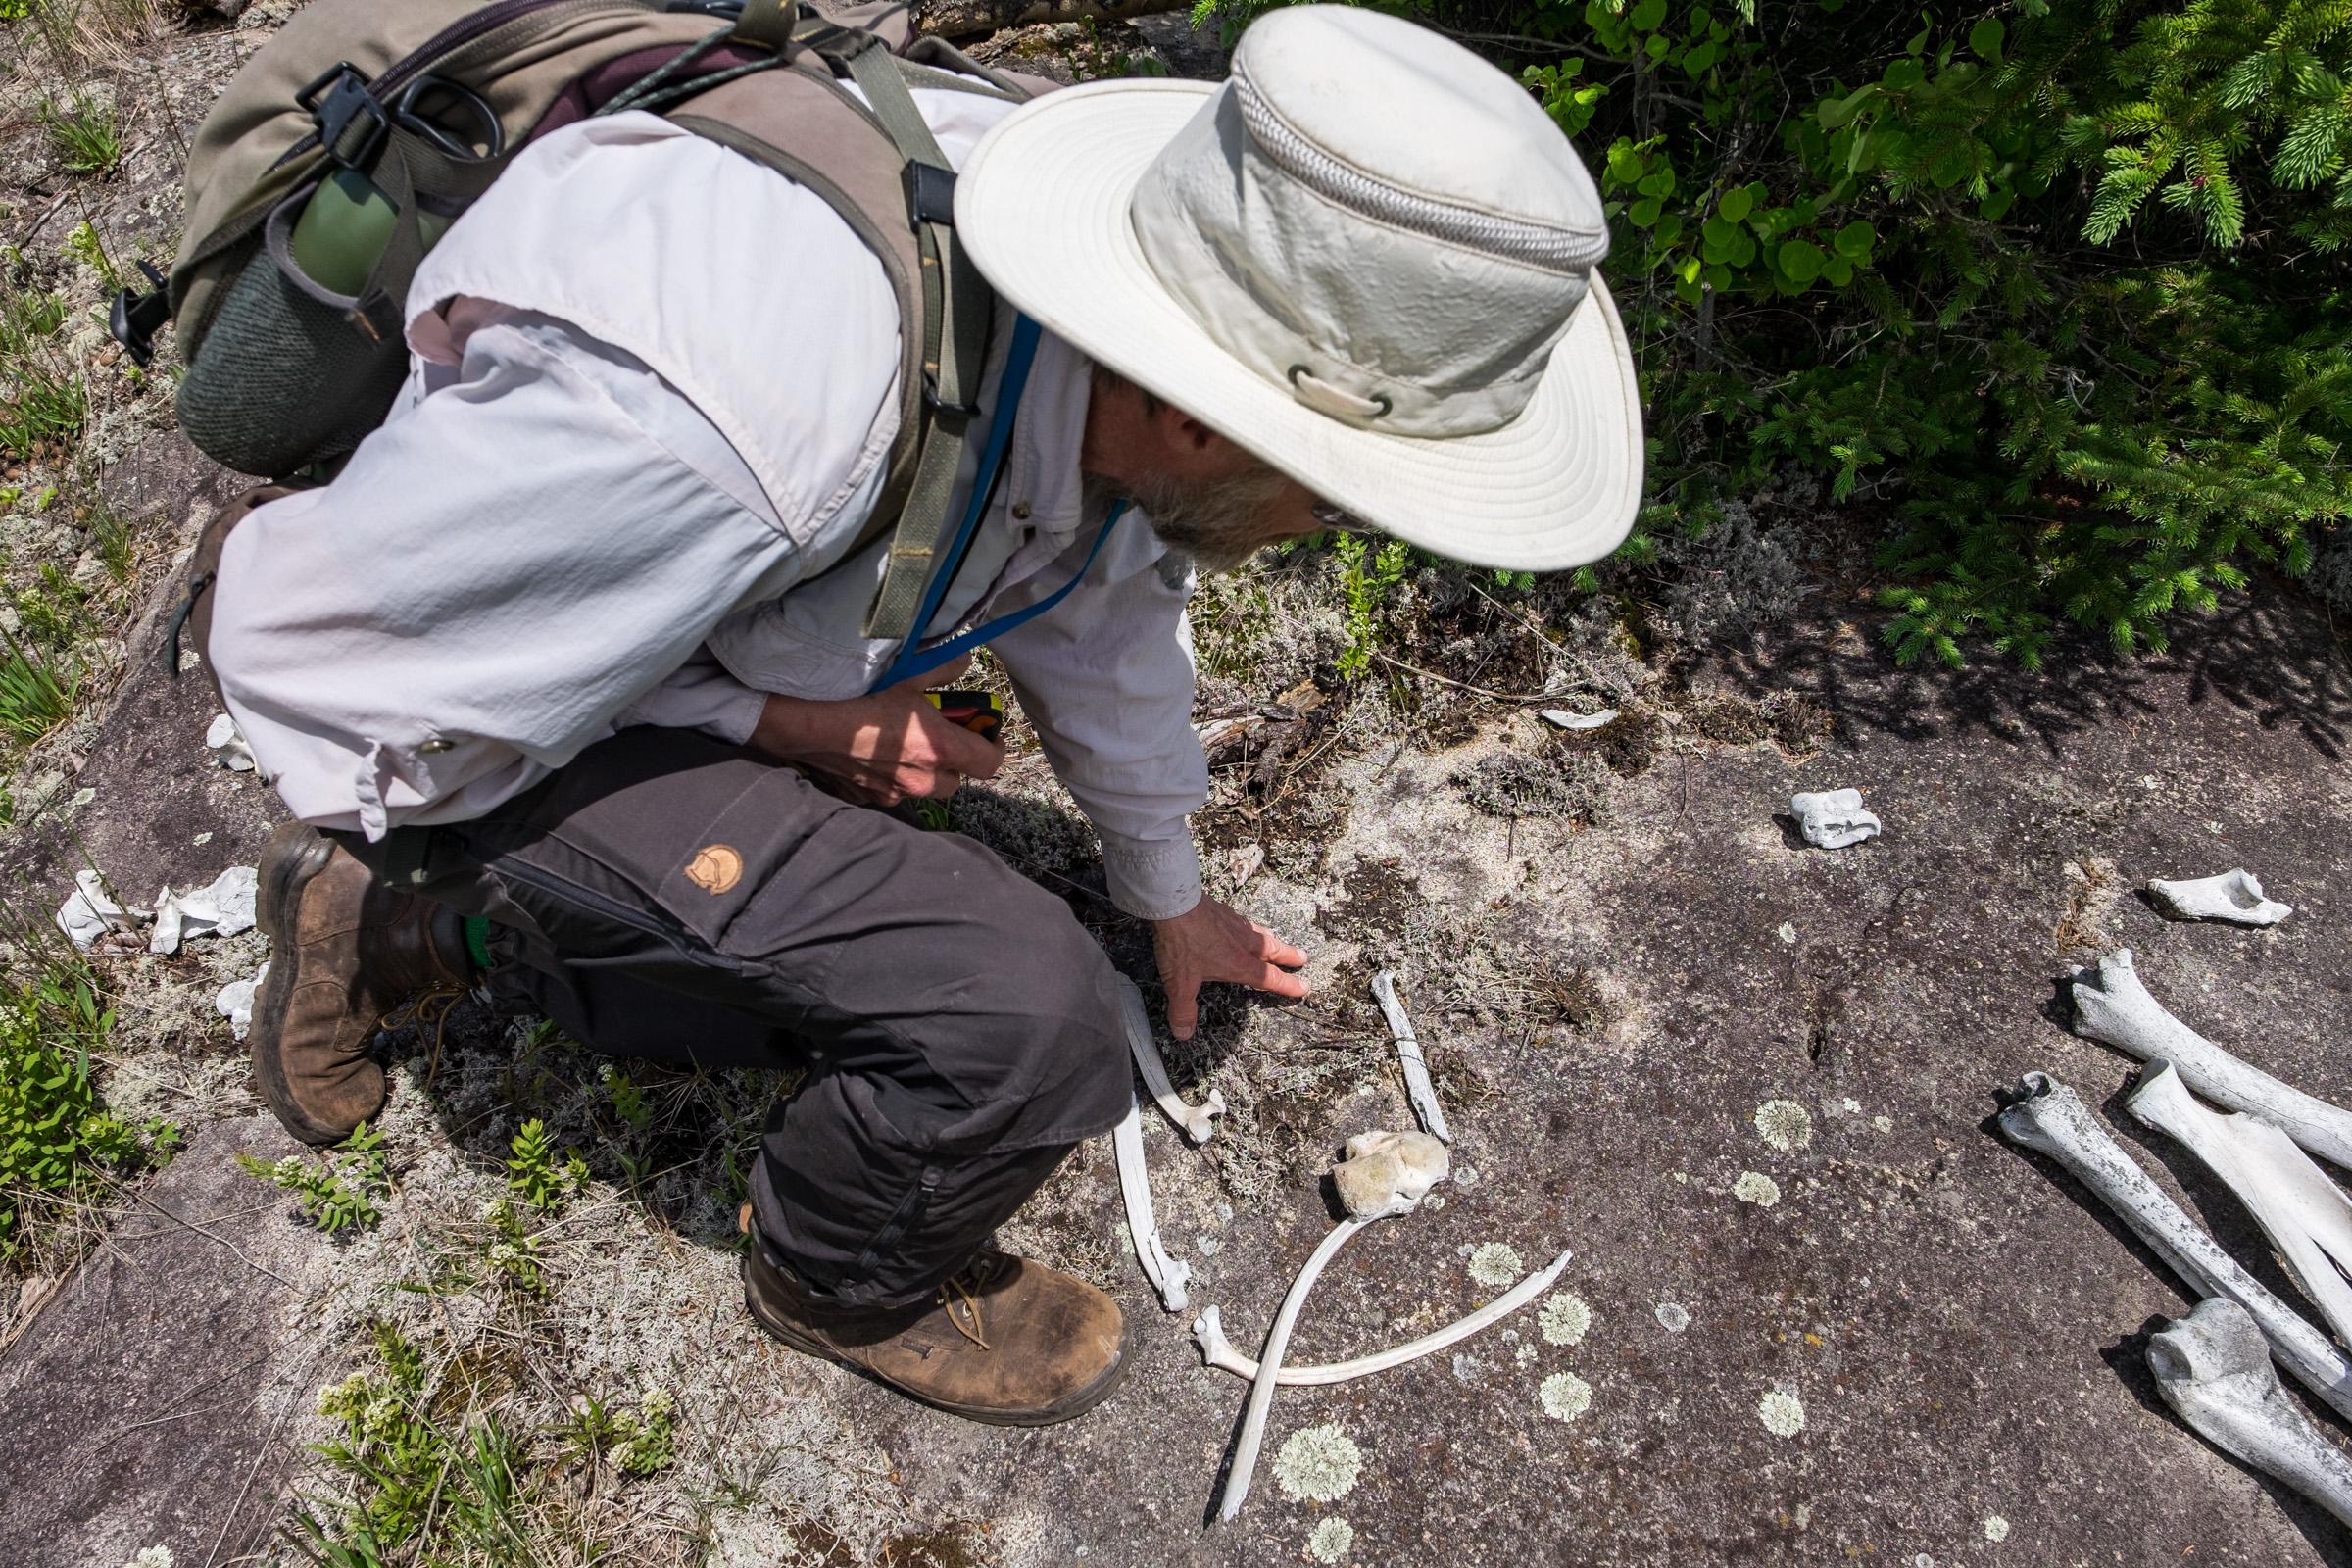 20160612-JI-Isle Royale National Park-_DSF0109.jpg